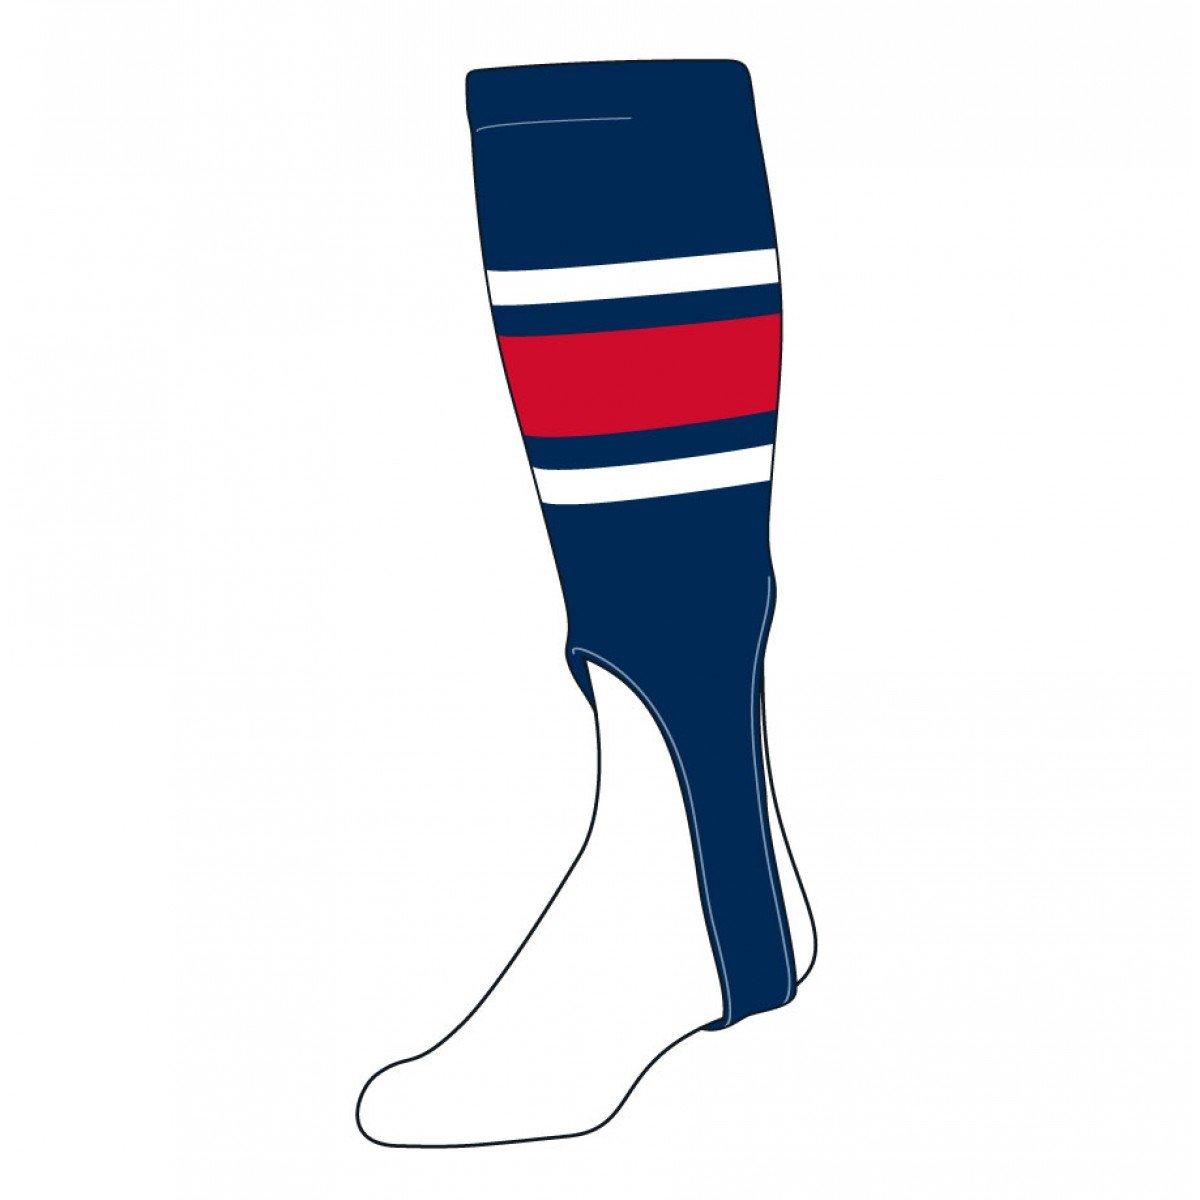 TCK Sports Striped 7 Baseball/Softball Stirrup Socks, Navy/White/Scarlet 300E1-153-7